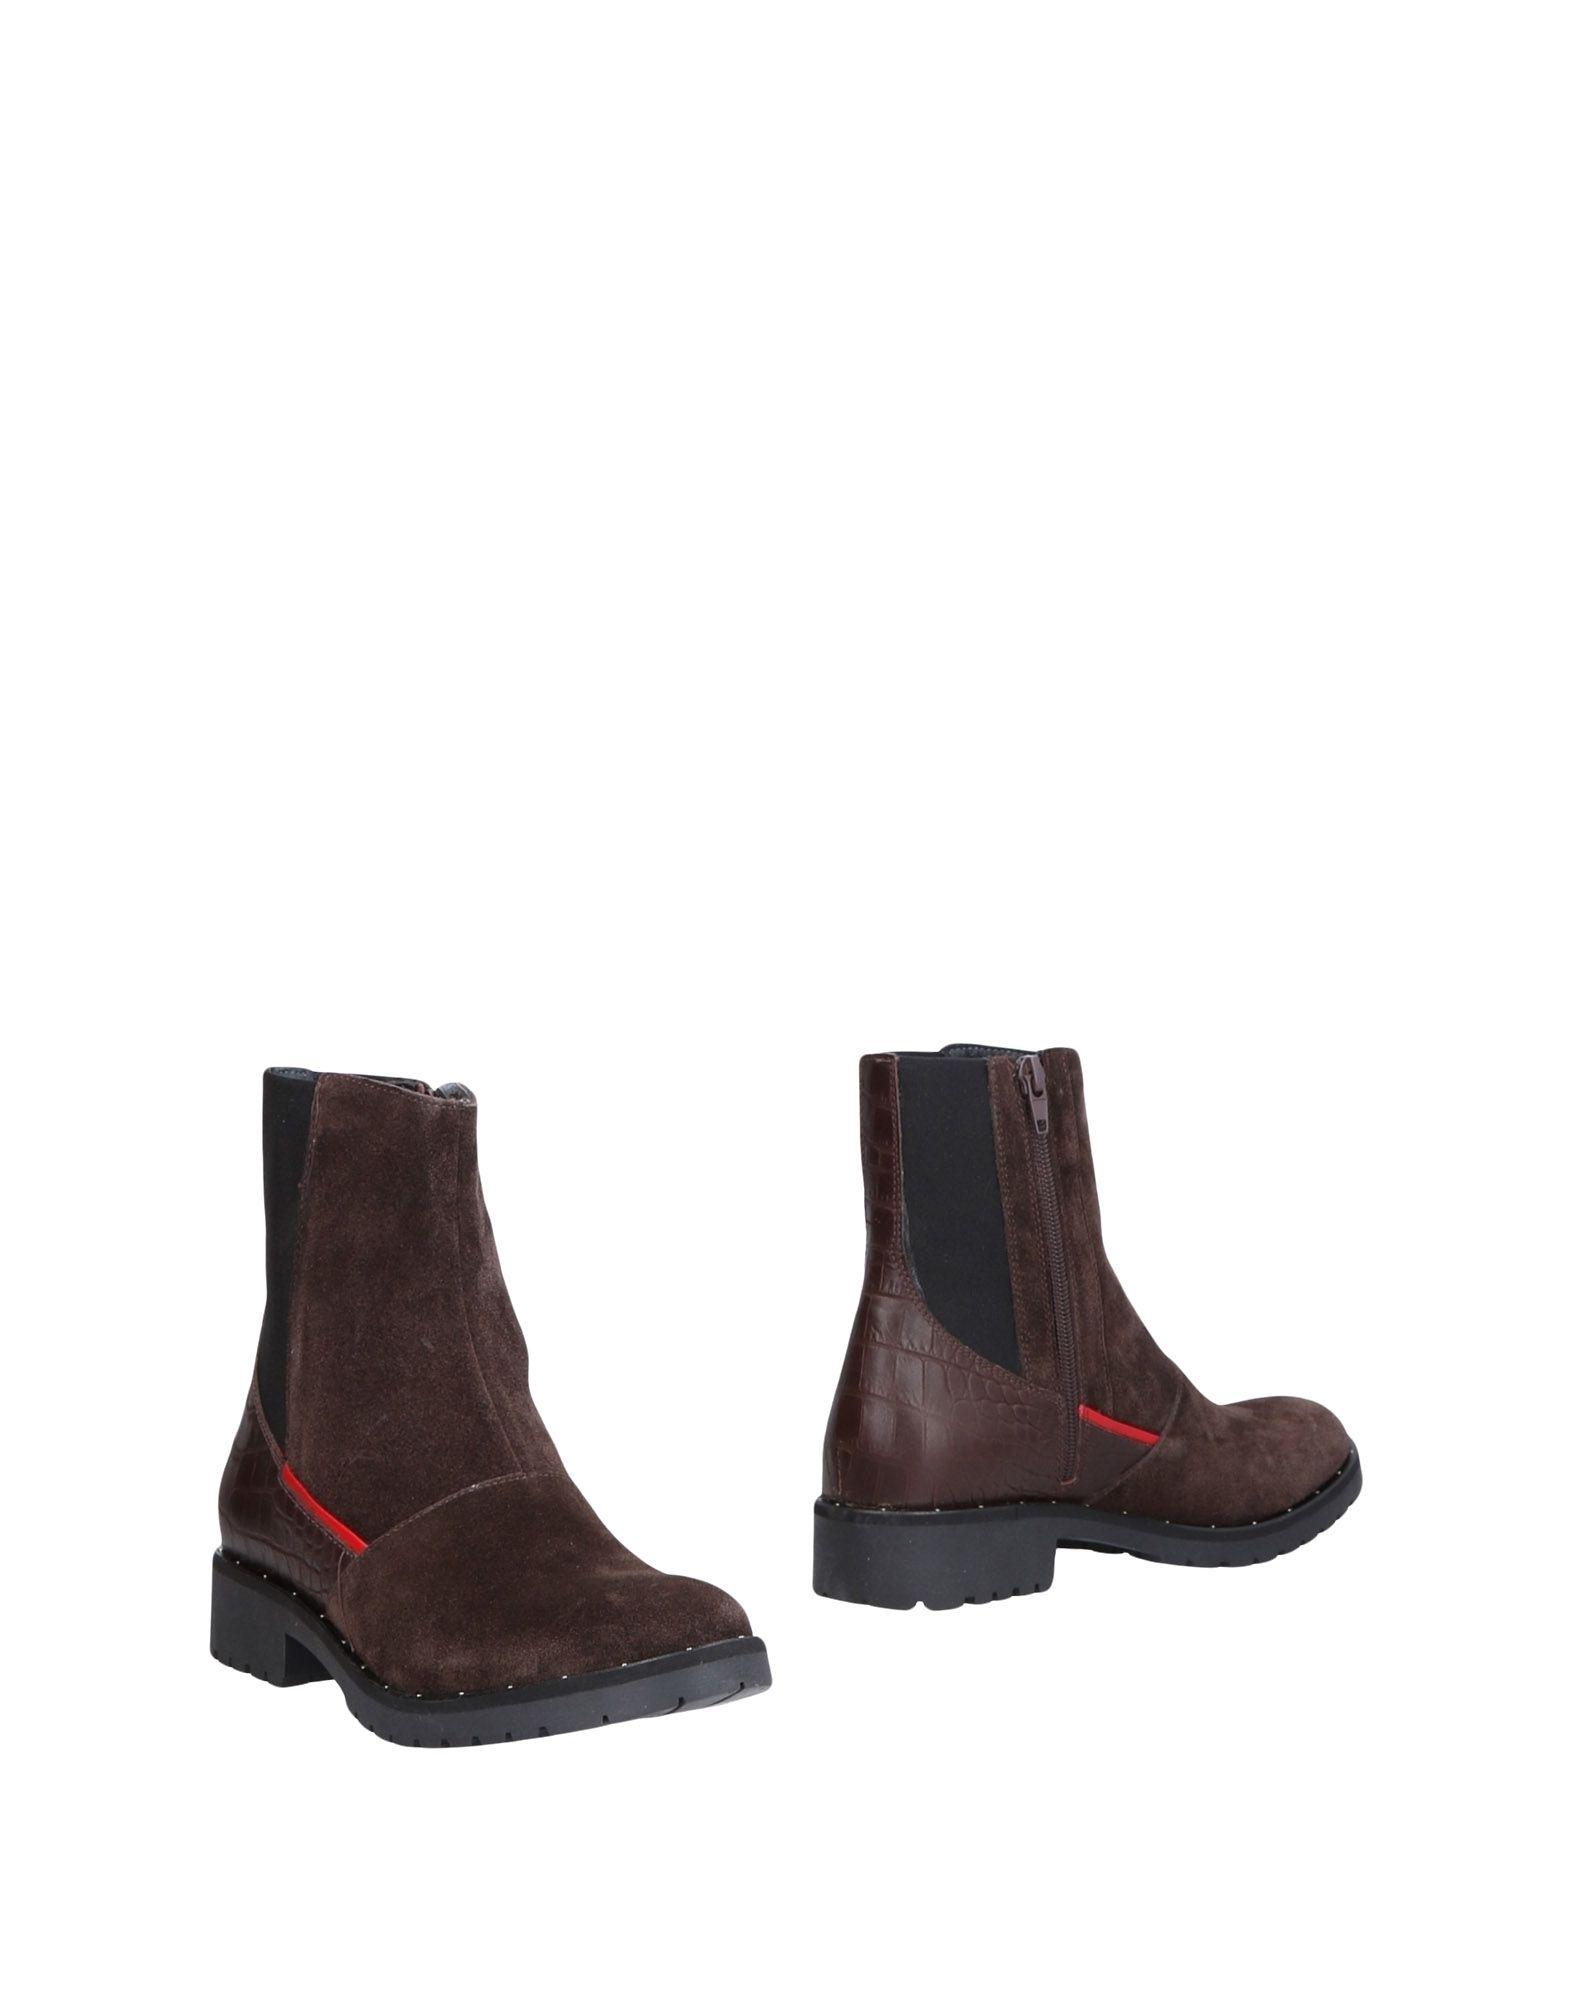 Massimo Granieri® Ankle Boot - Women Massimo on Granieri® Ankle Boots online on Massimo  Australia - 11467591GL 87db1c